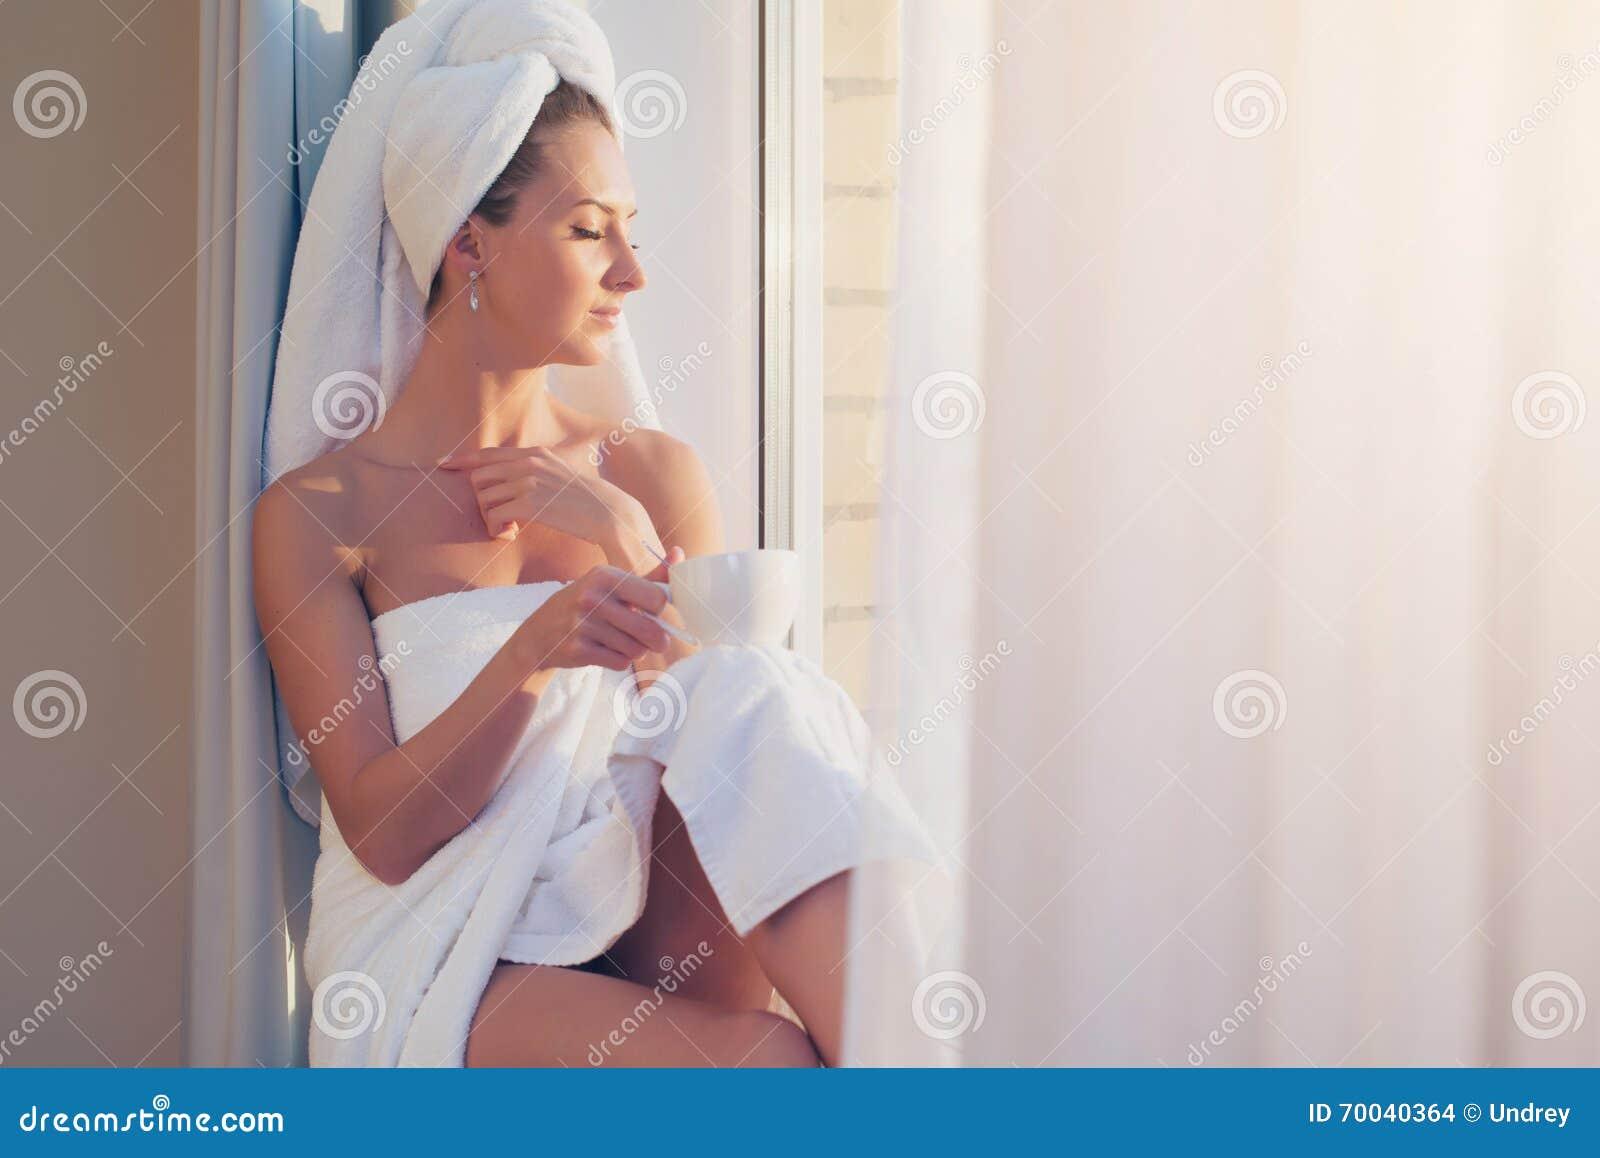 After shower jackpot window voyeur 3